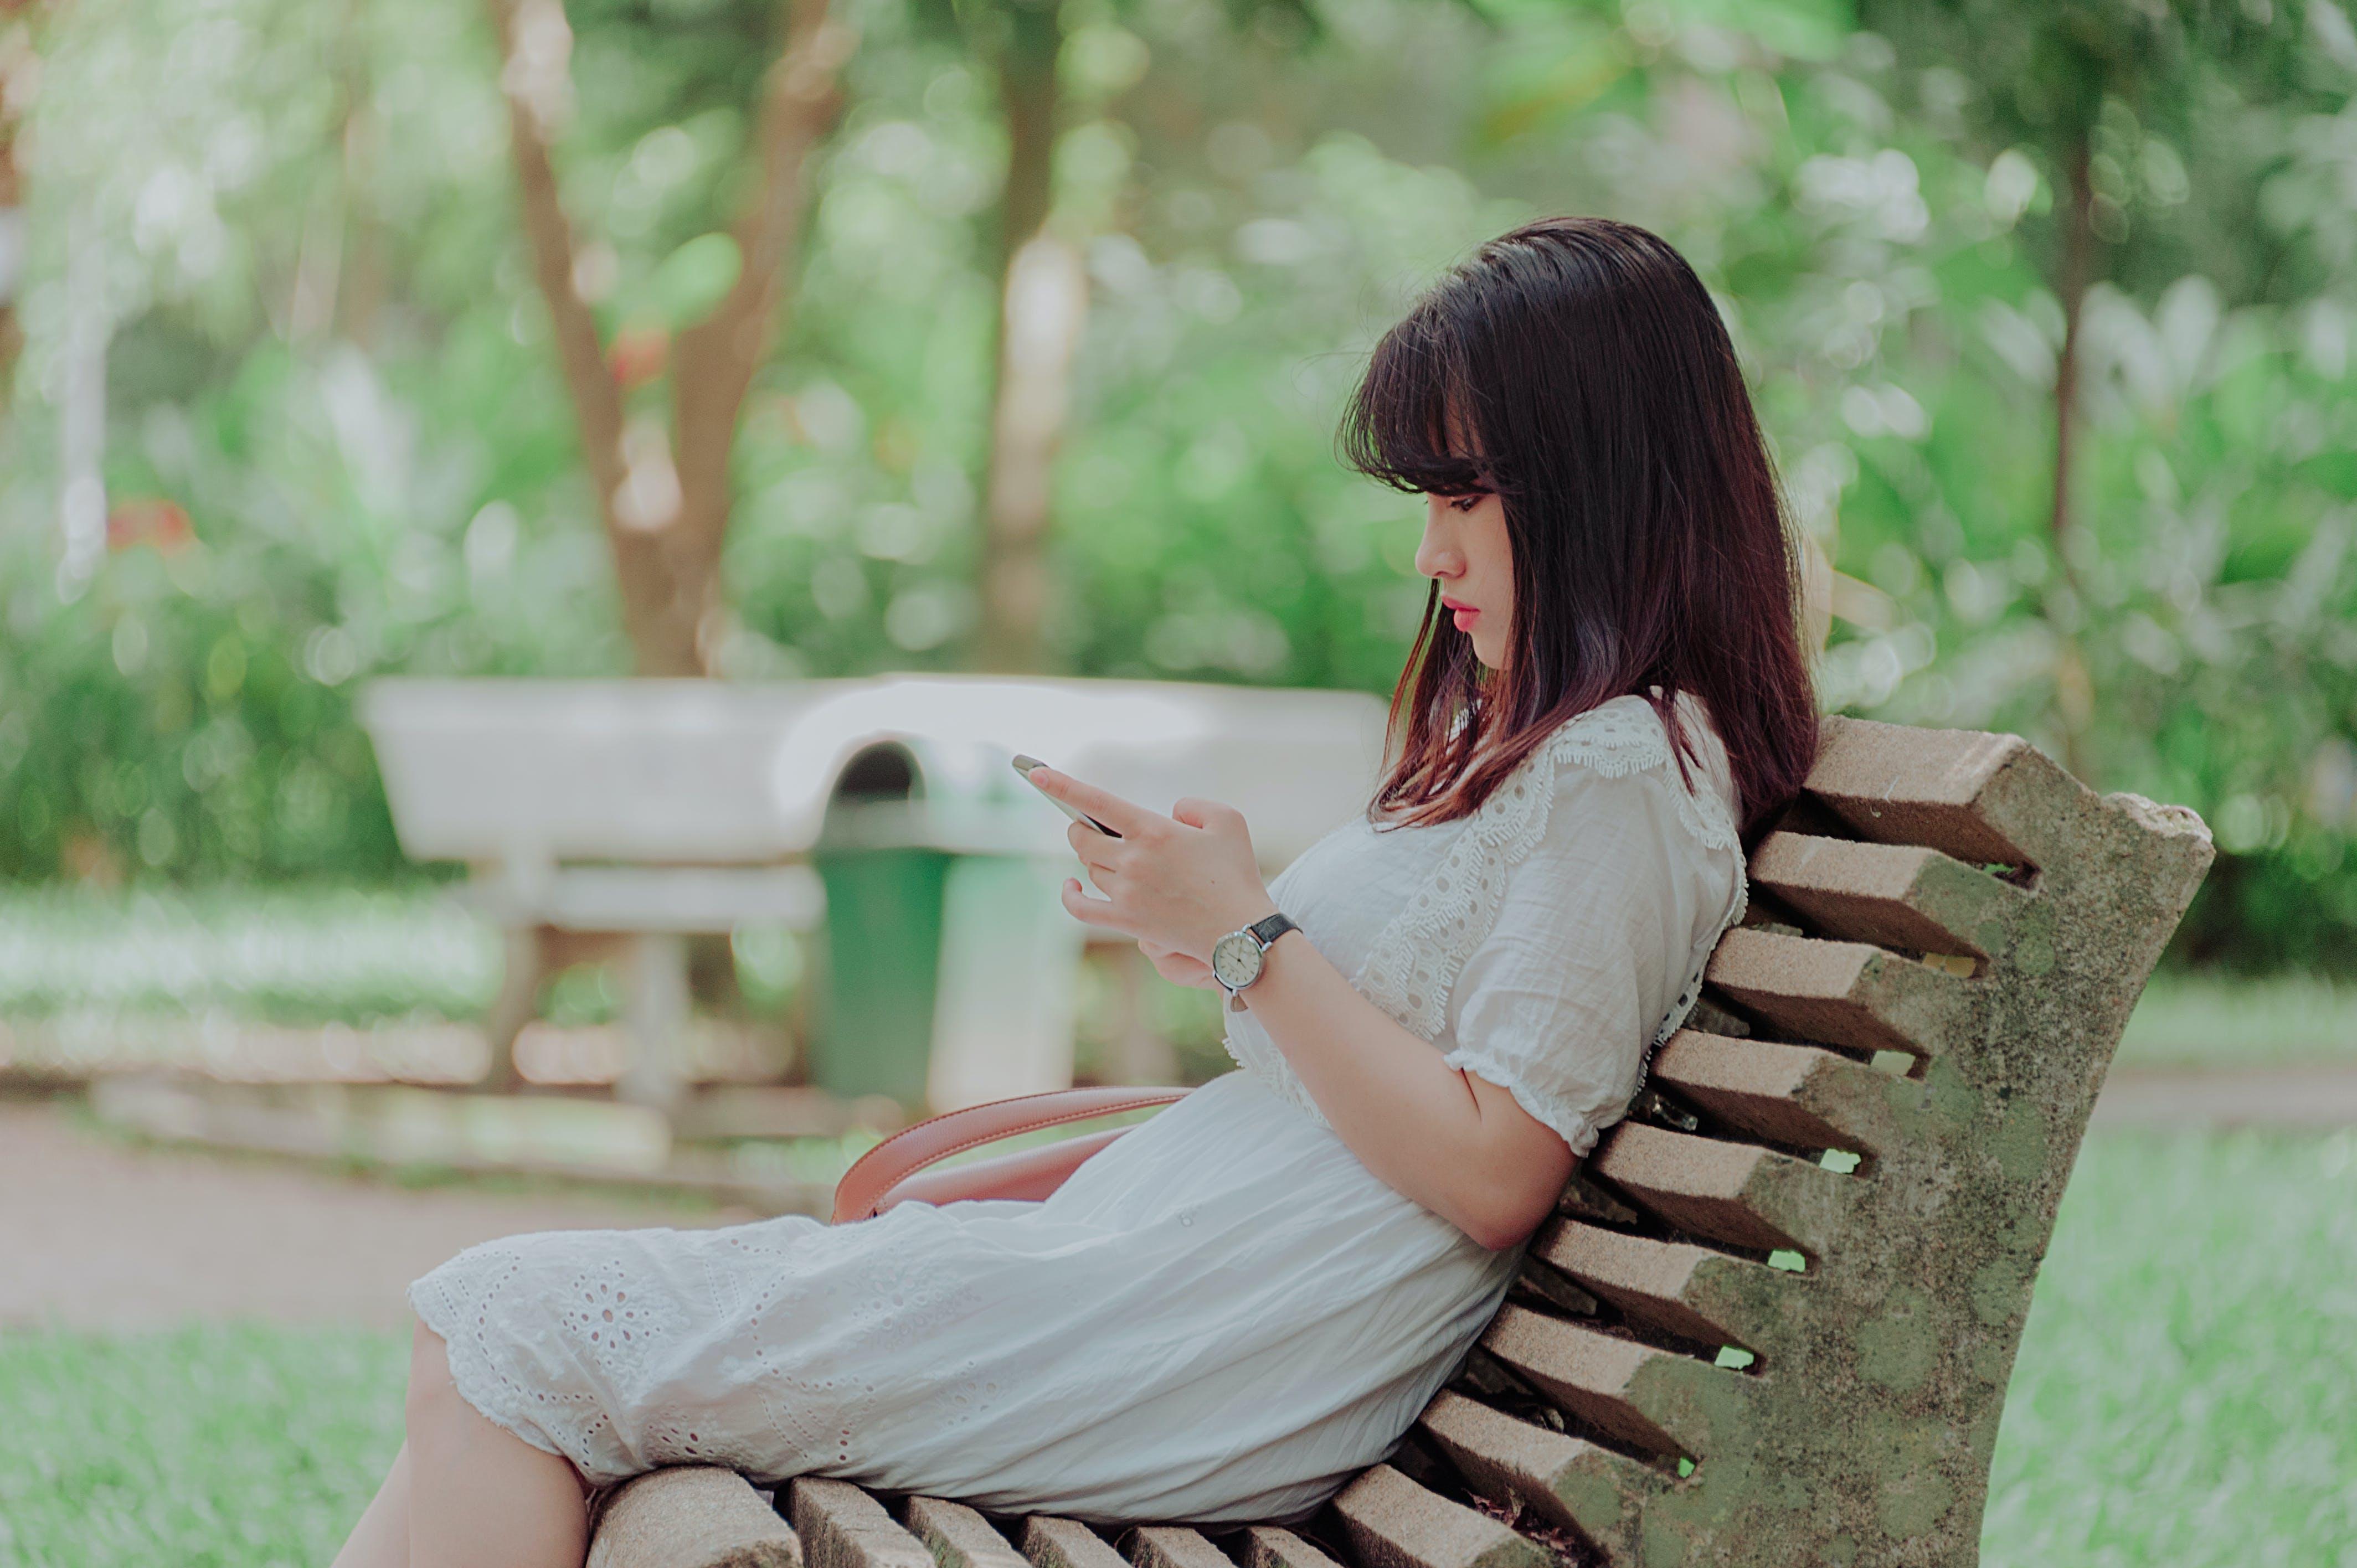 Woman Wearing White Dress Sitting on Bench